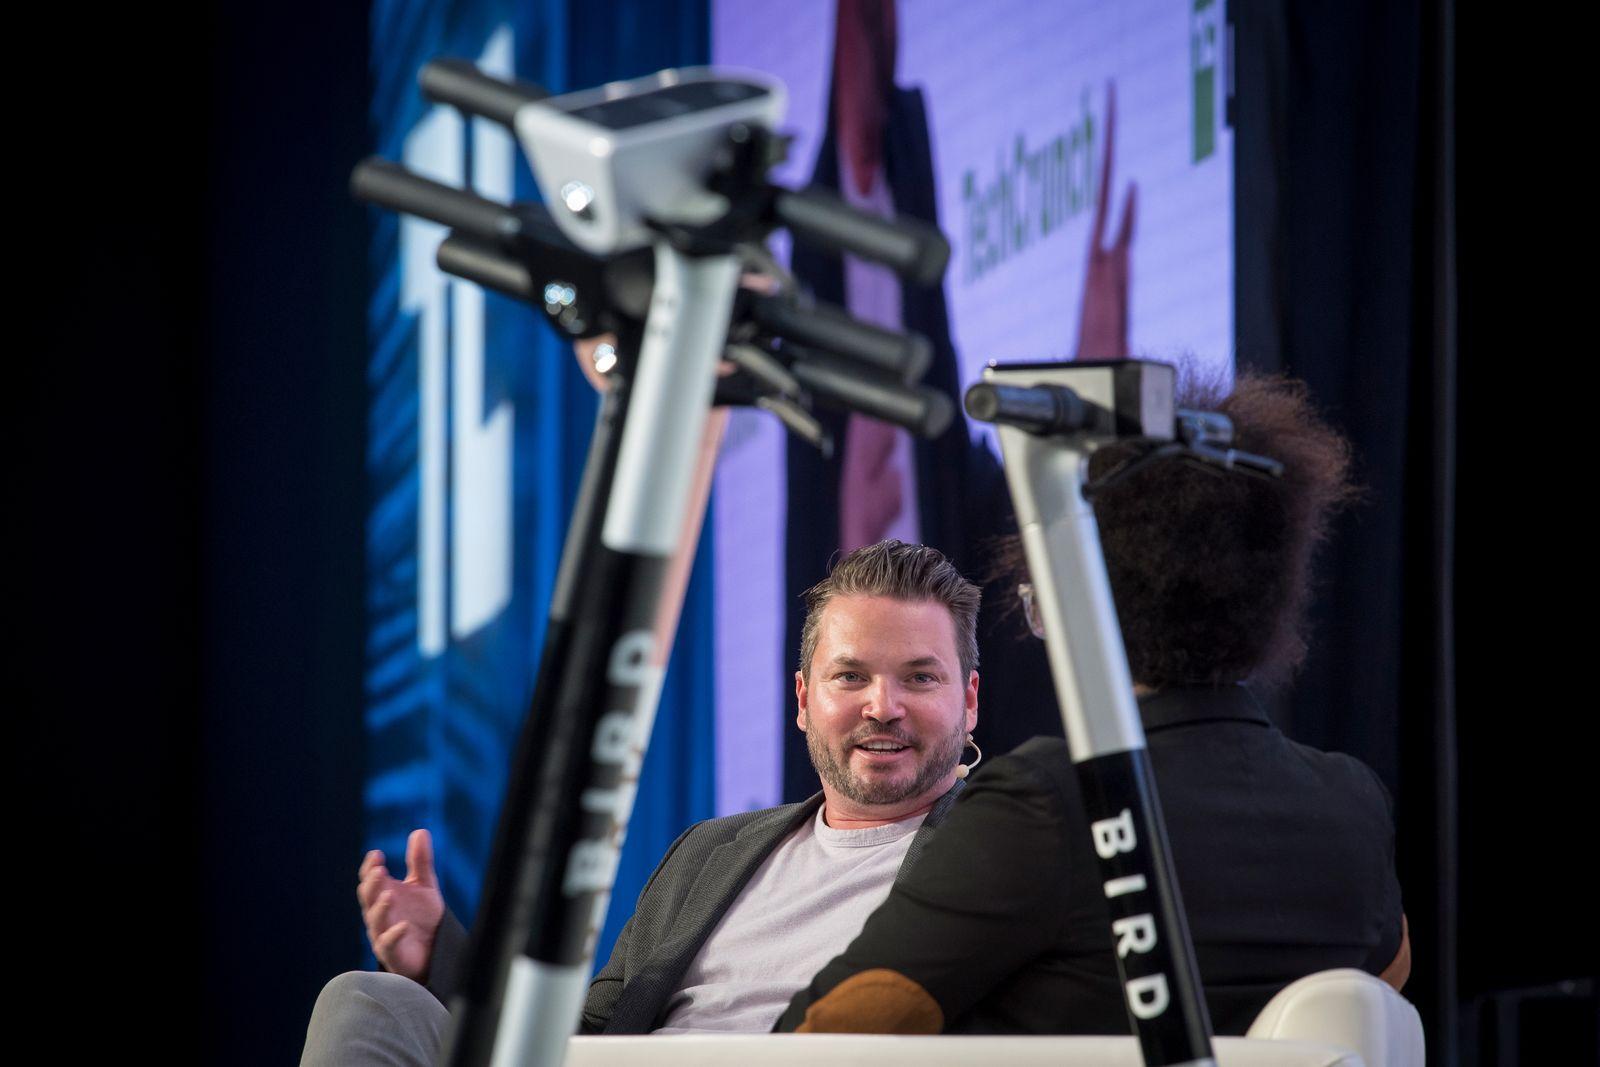 Key Speakers At TechCrunch Disrupt SF 2019 Summit